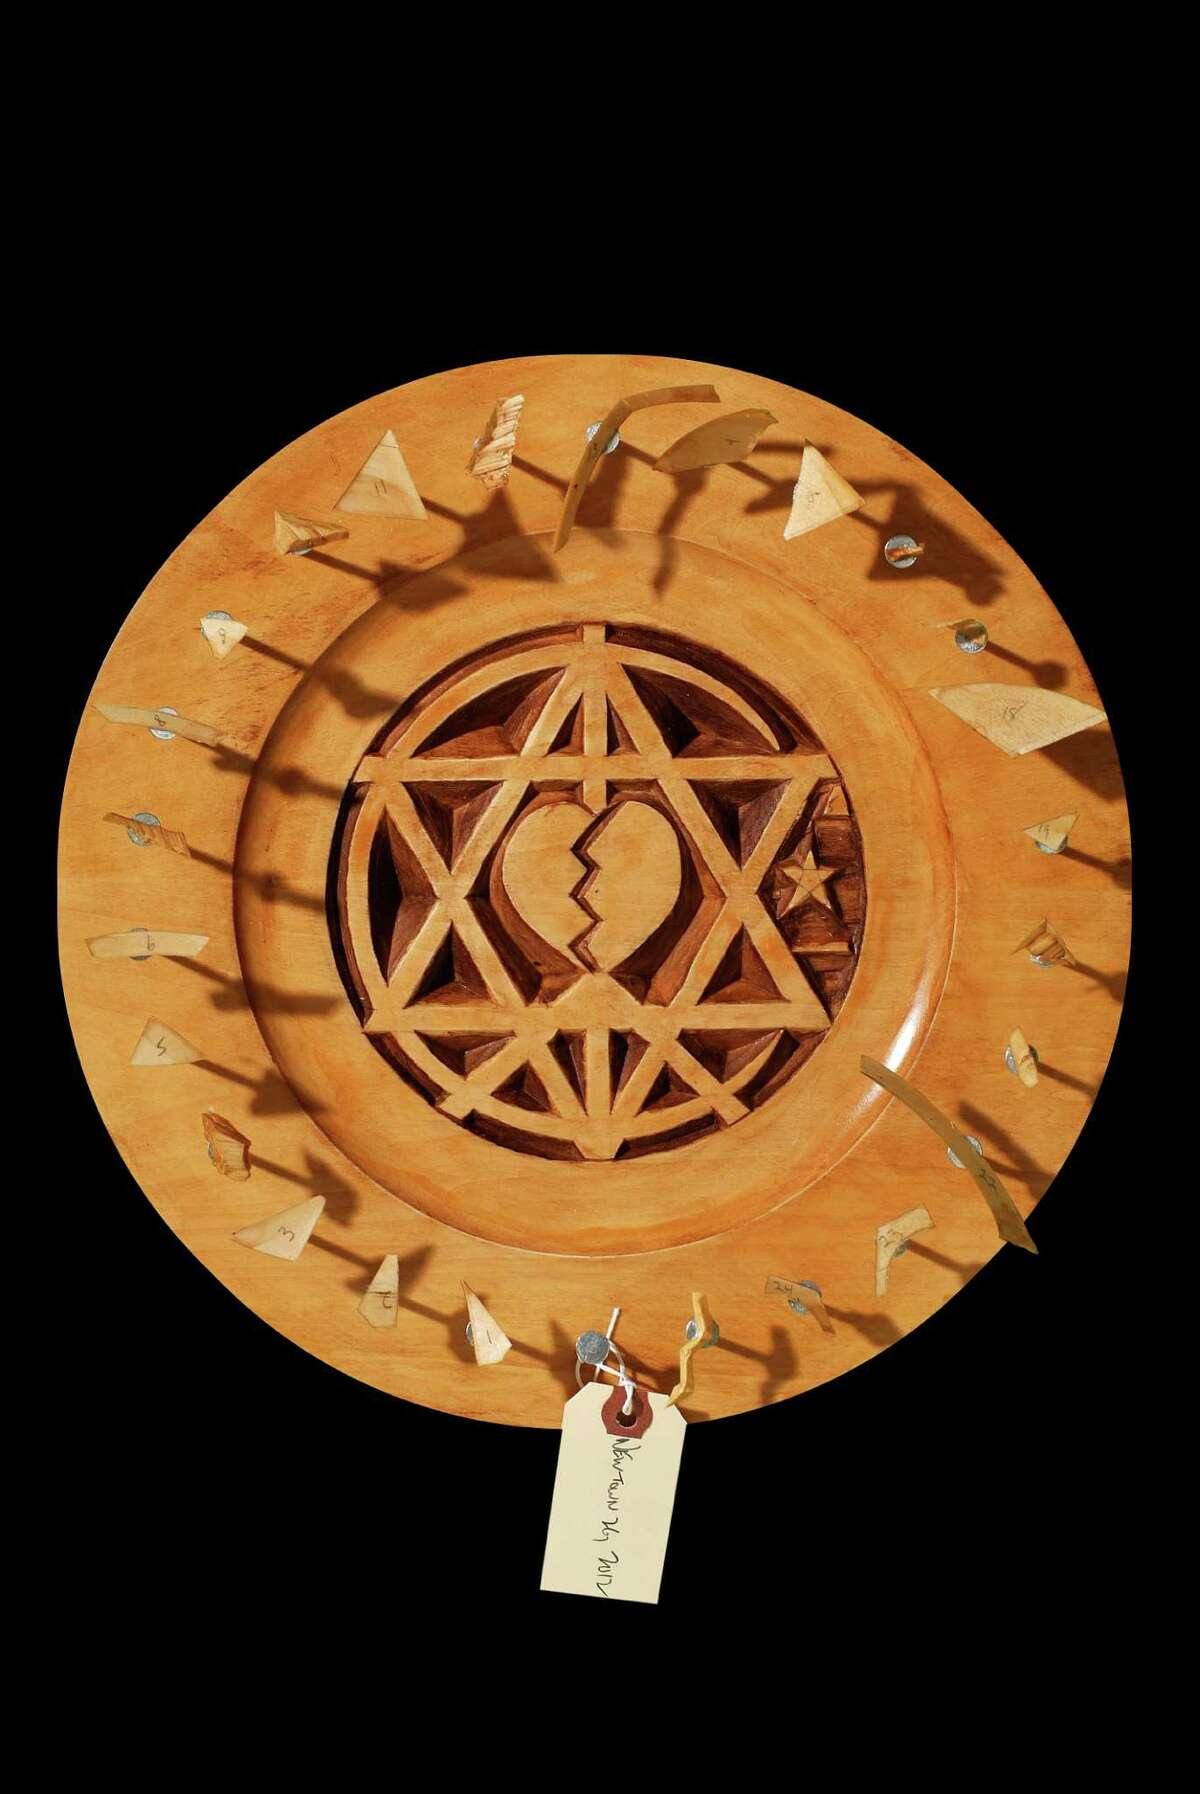 Wood carver Harvey Paris, of Fairfield, created